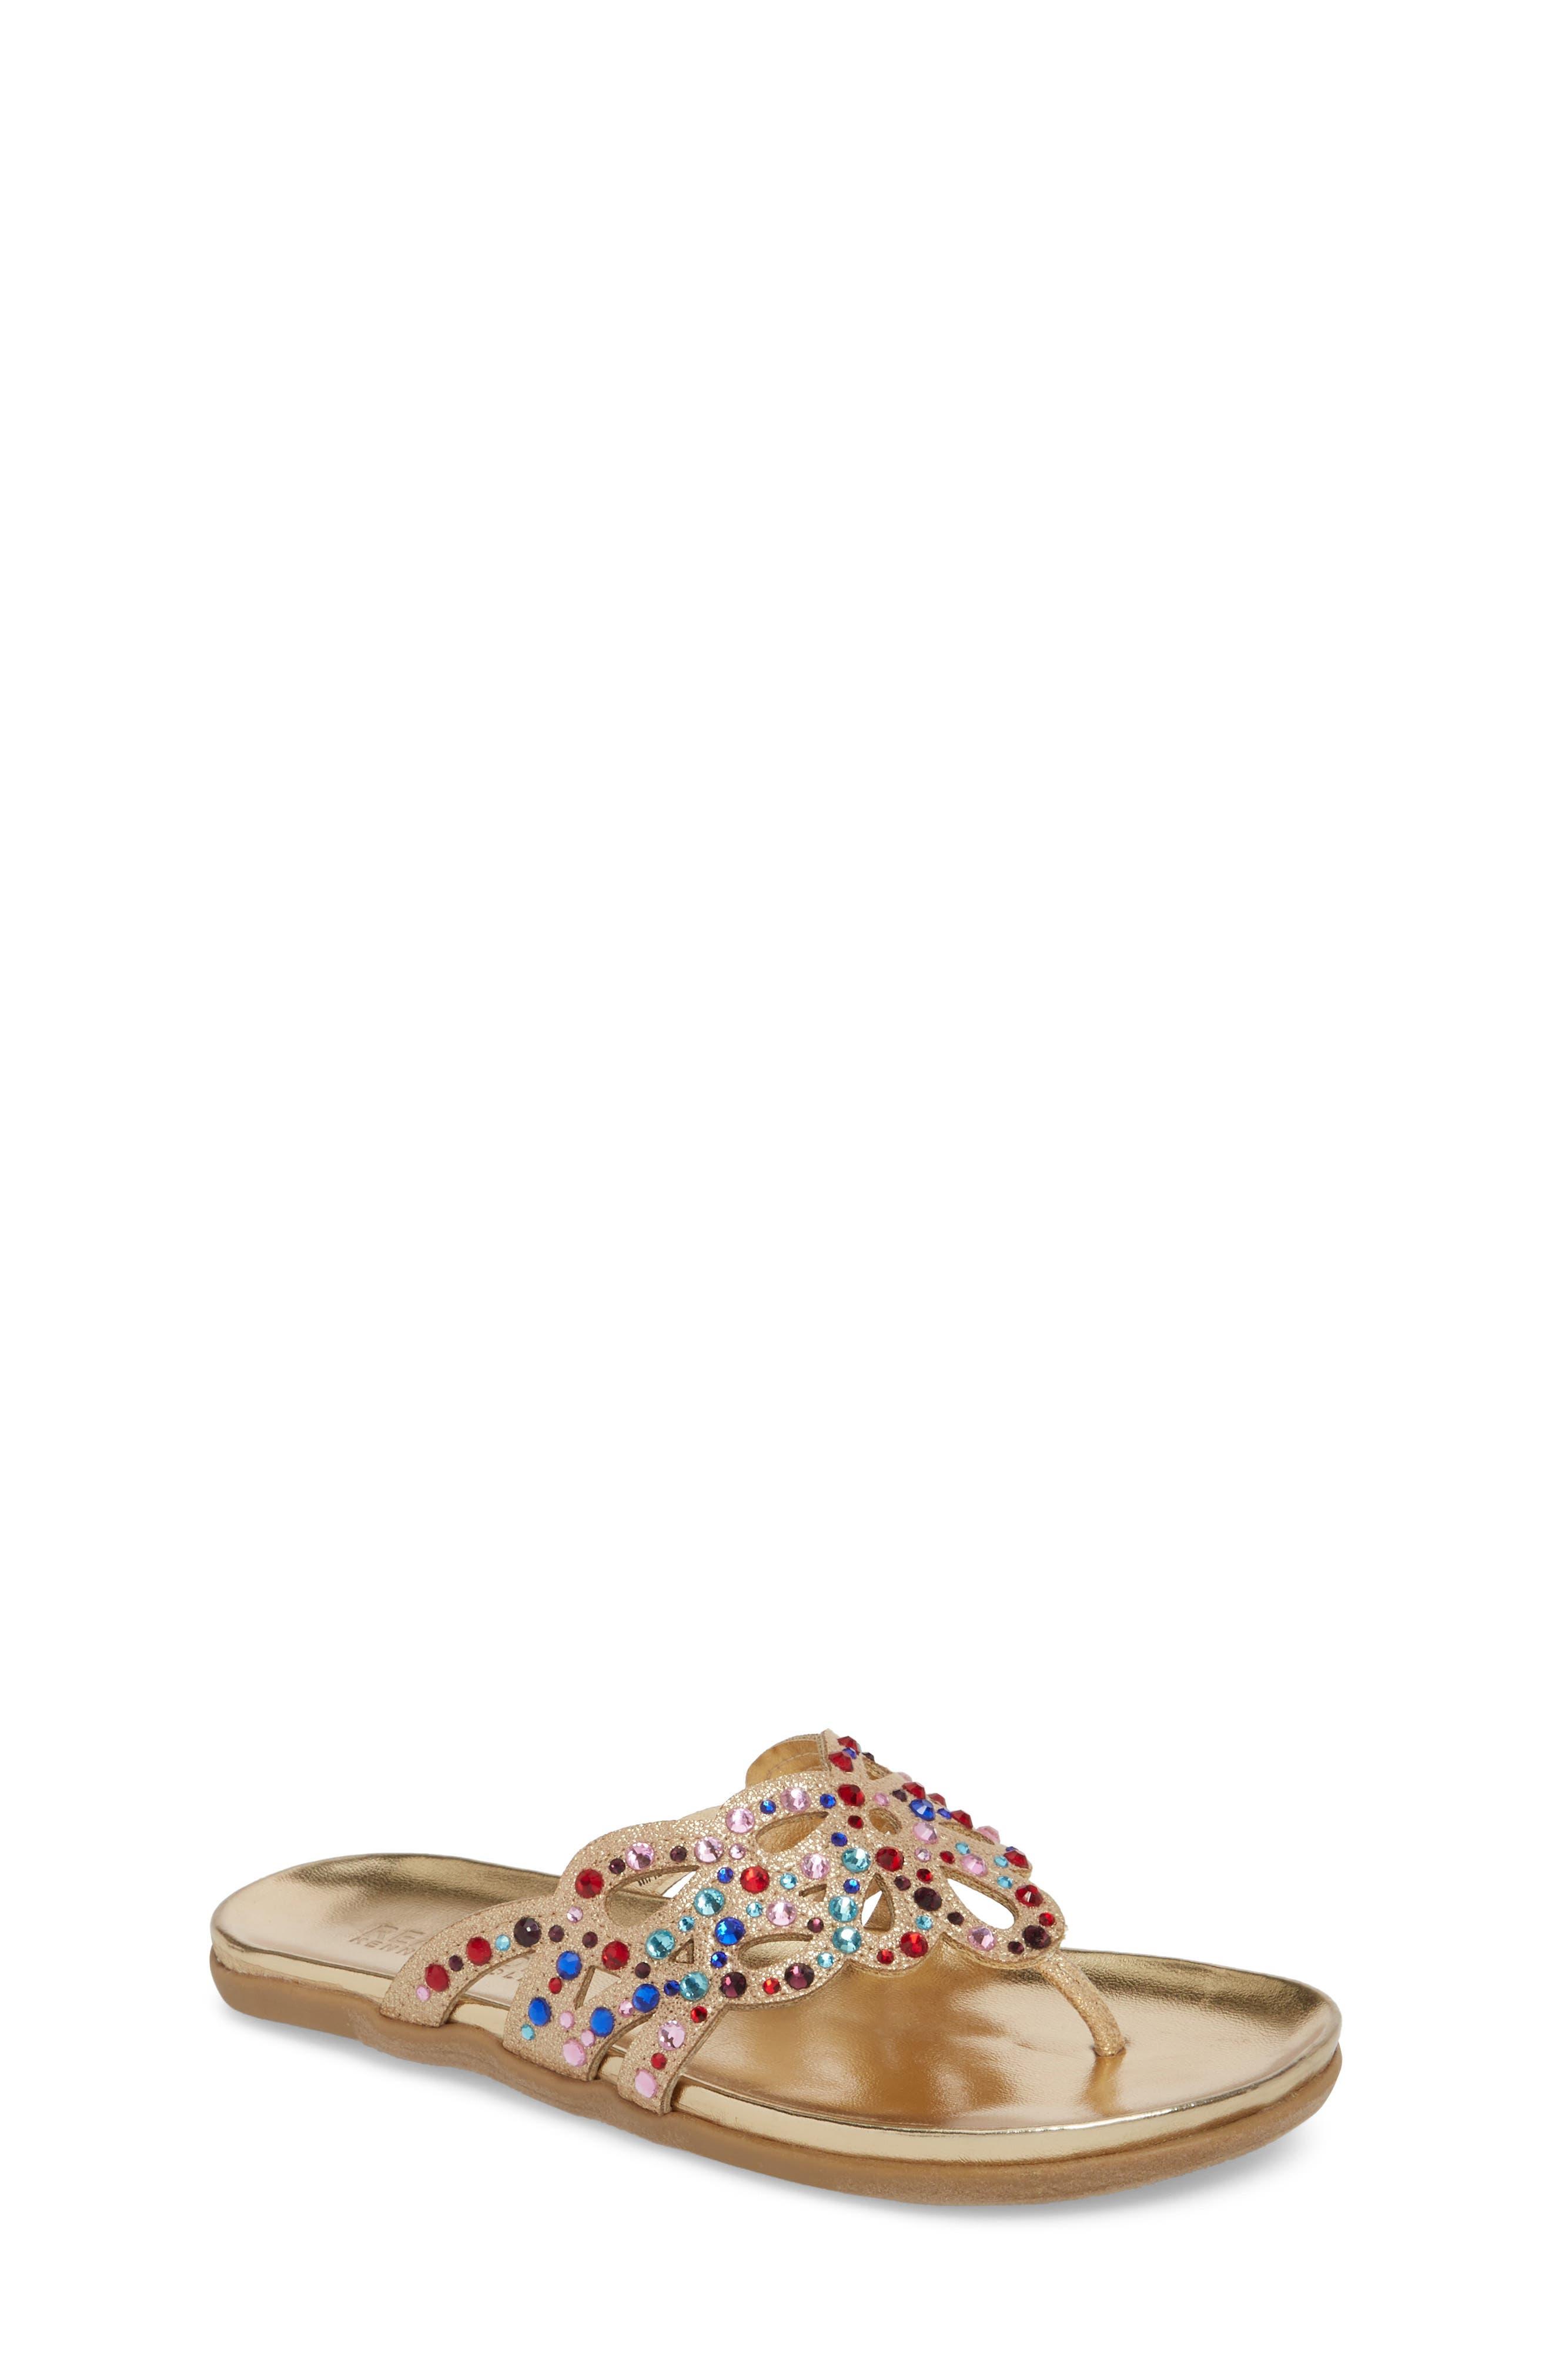 Kenneth Cole New York Flutter Metallic Crystal Thong Sandal,                         Main,                         color, GOLD MULTI